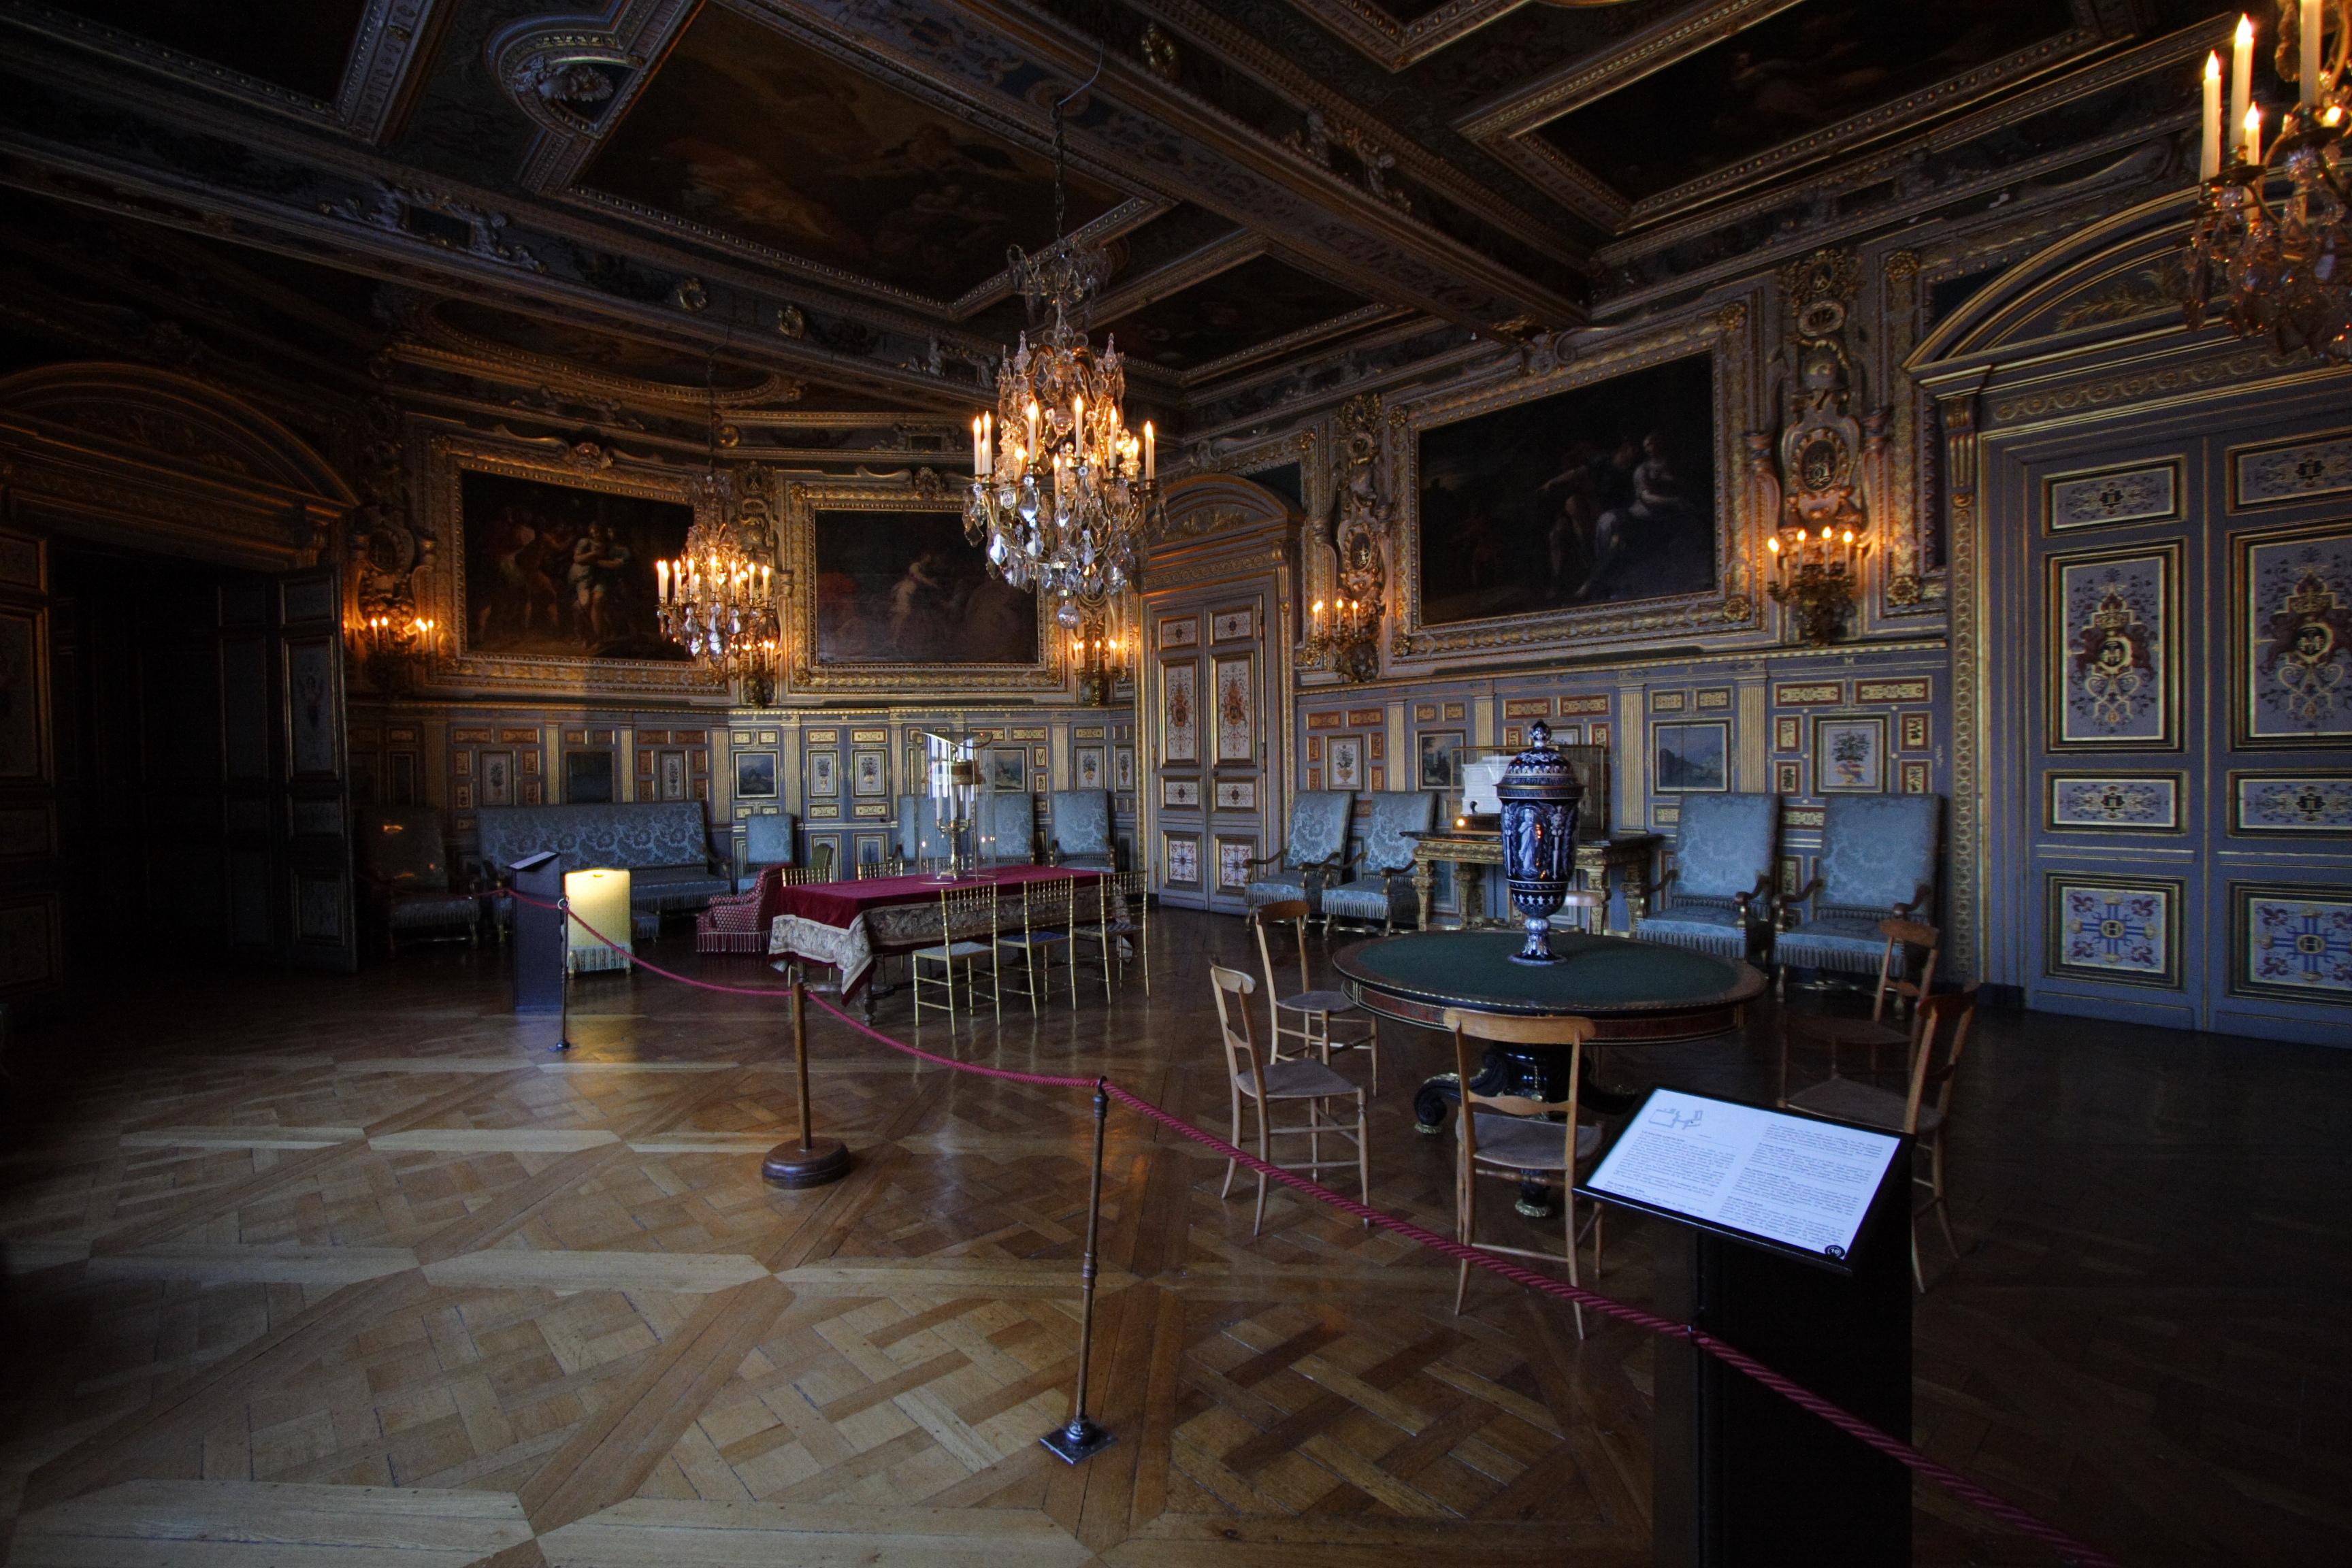 file chateau de fontainebleau fra 020 jpg wikimedia commons. Black Bedroom Furniture Sets. Home Design Ideas